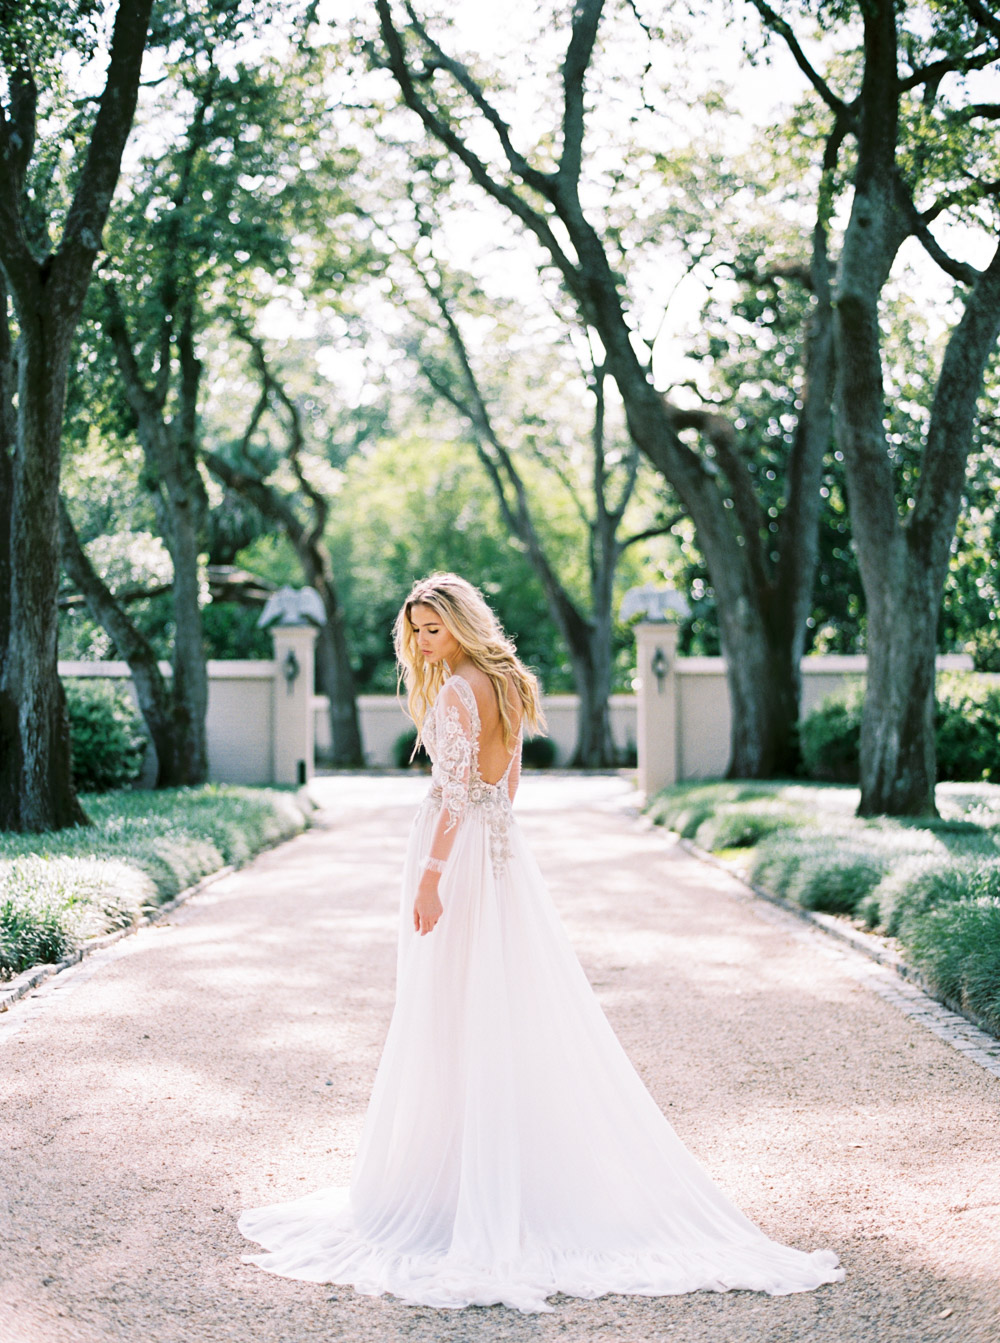 Katie Grant Photography (24 of 45).jpg